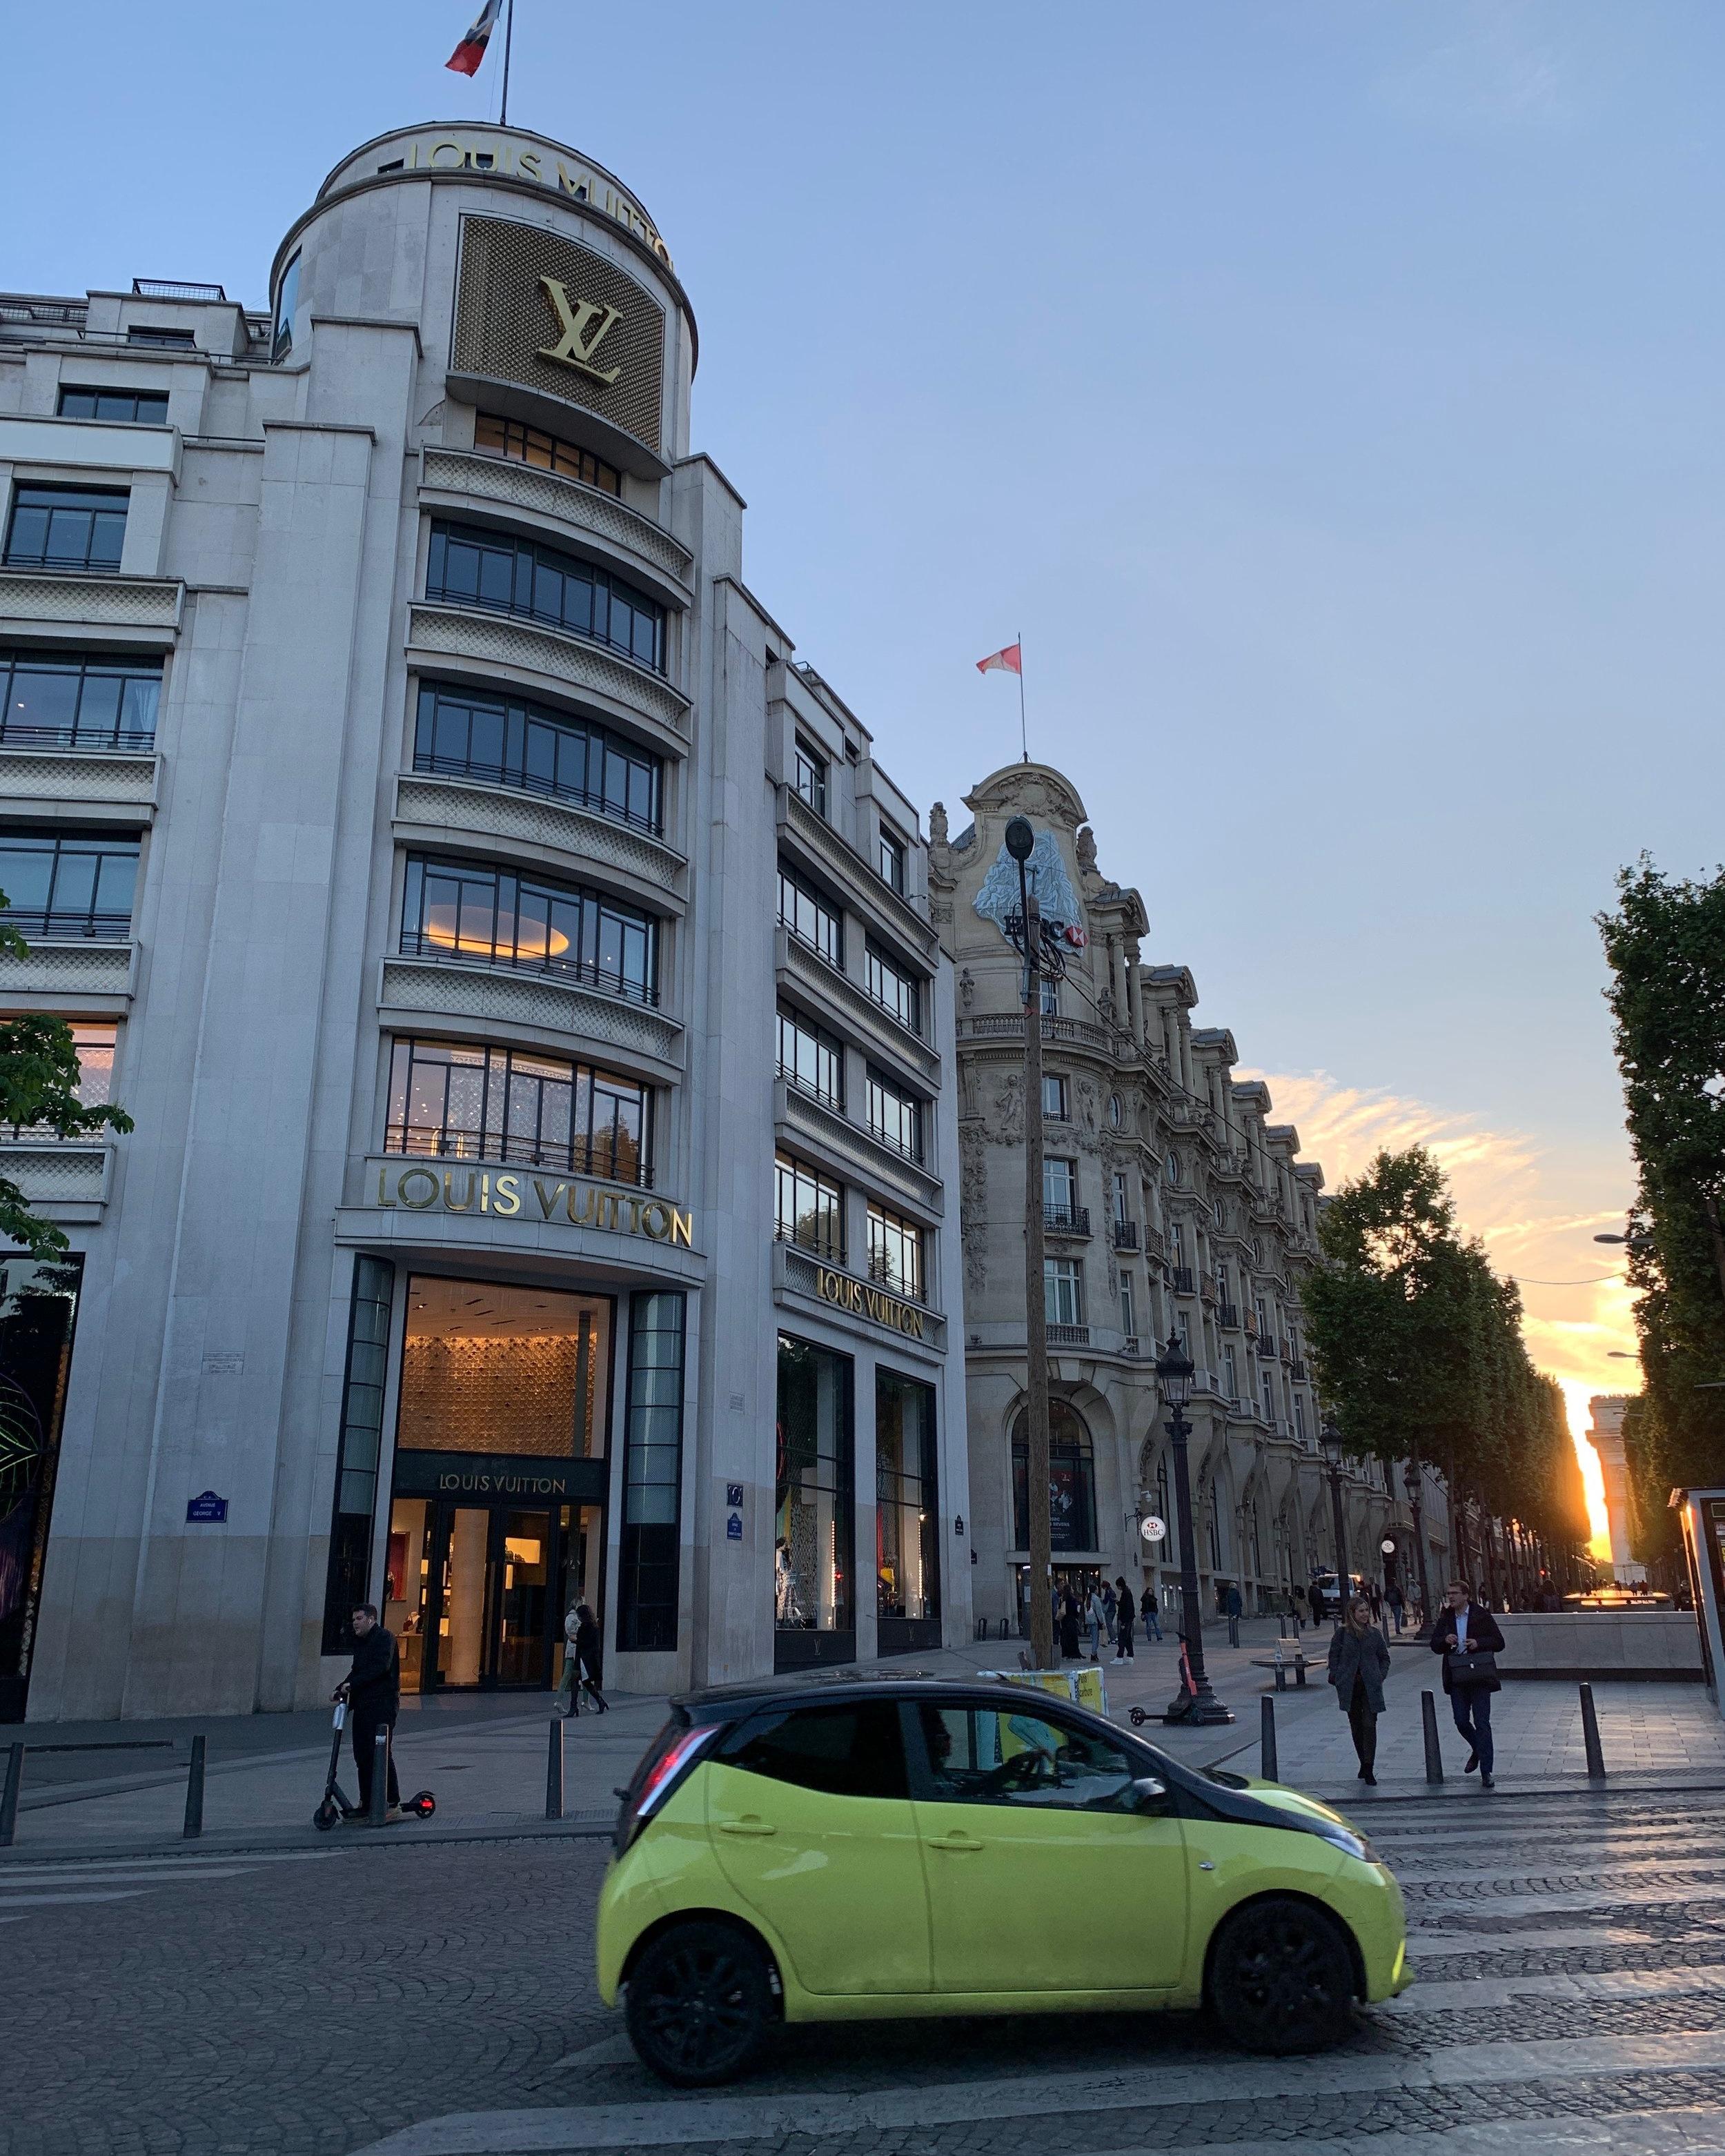 We could easily walk to the famous Champs-Élysées